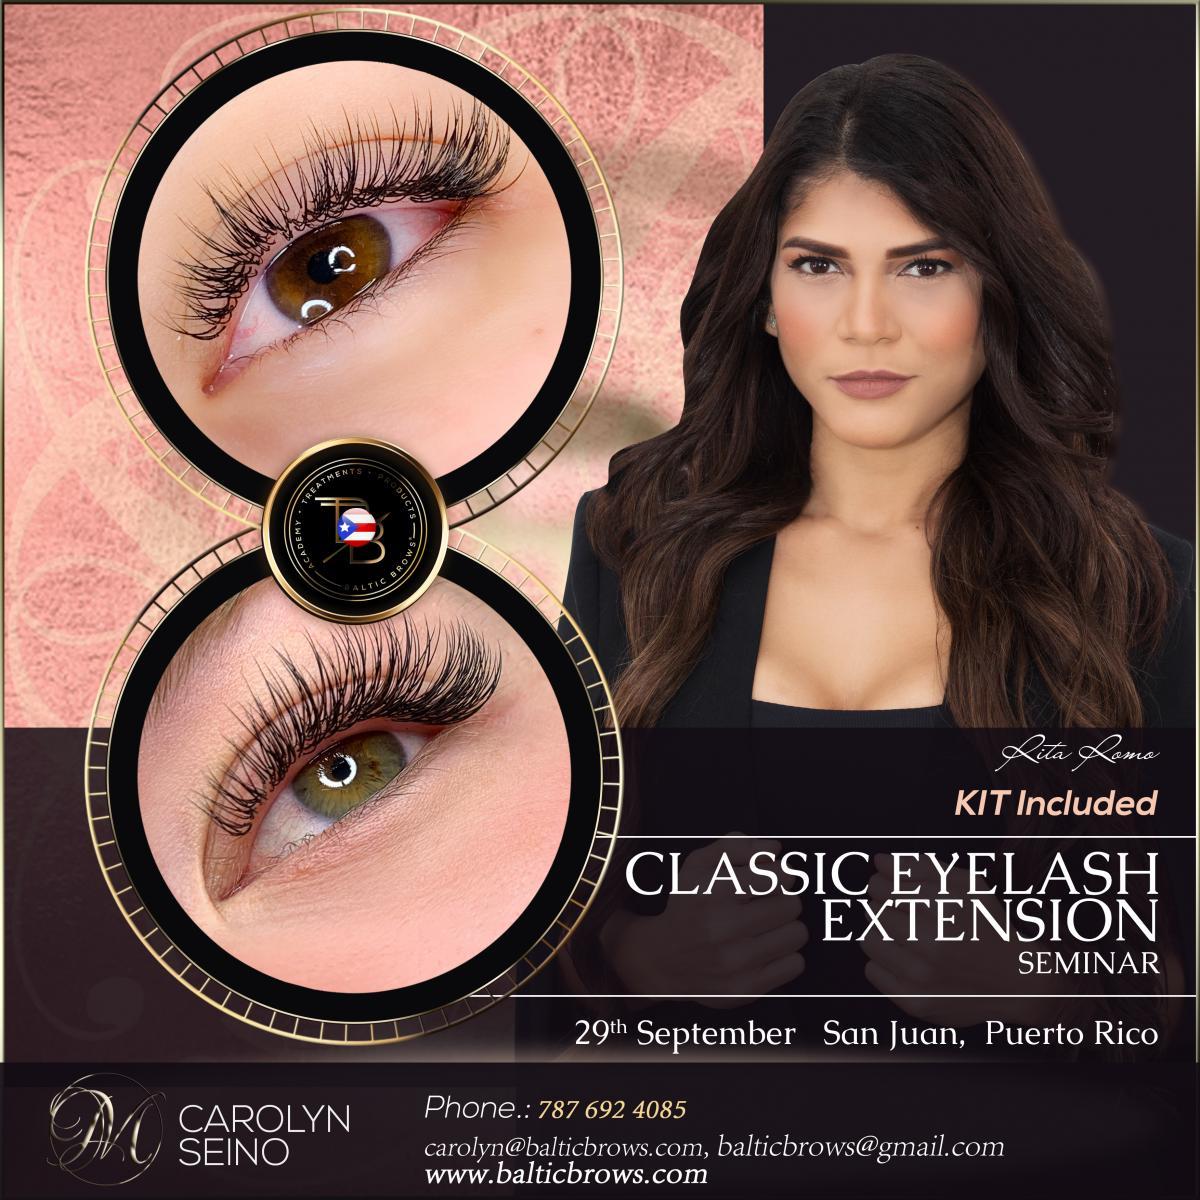 Classic eyelashes extension seminar